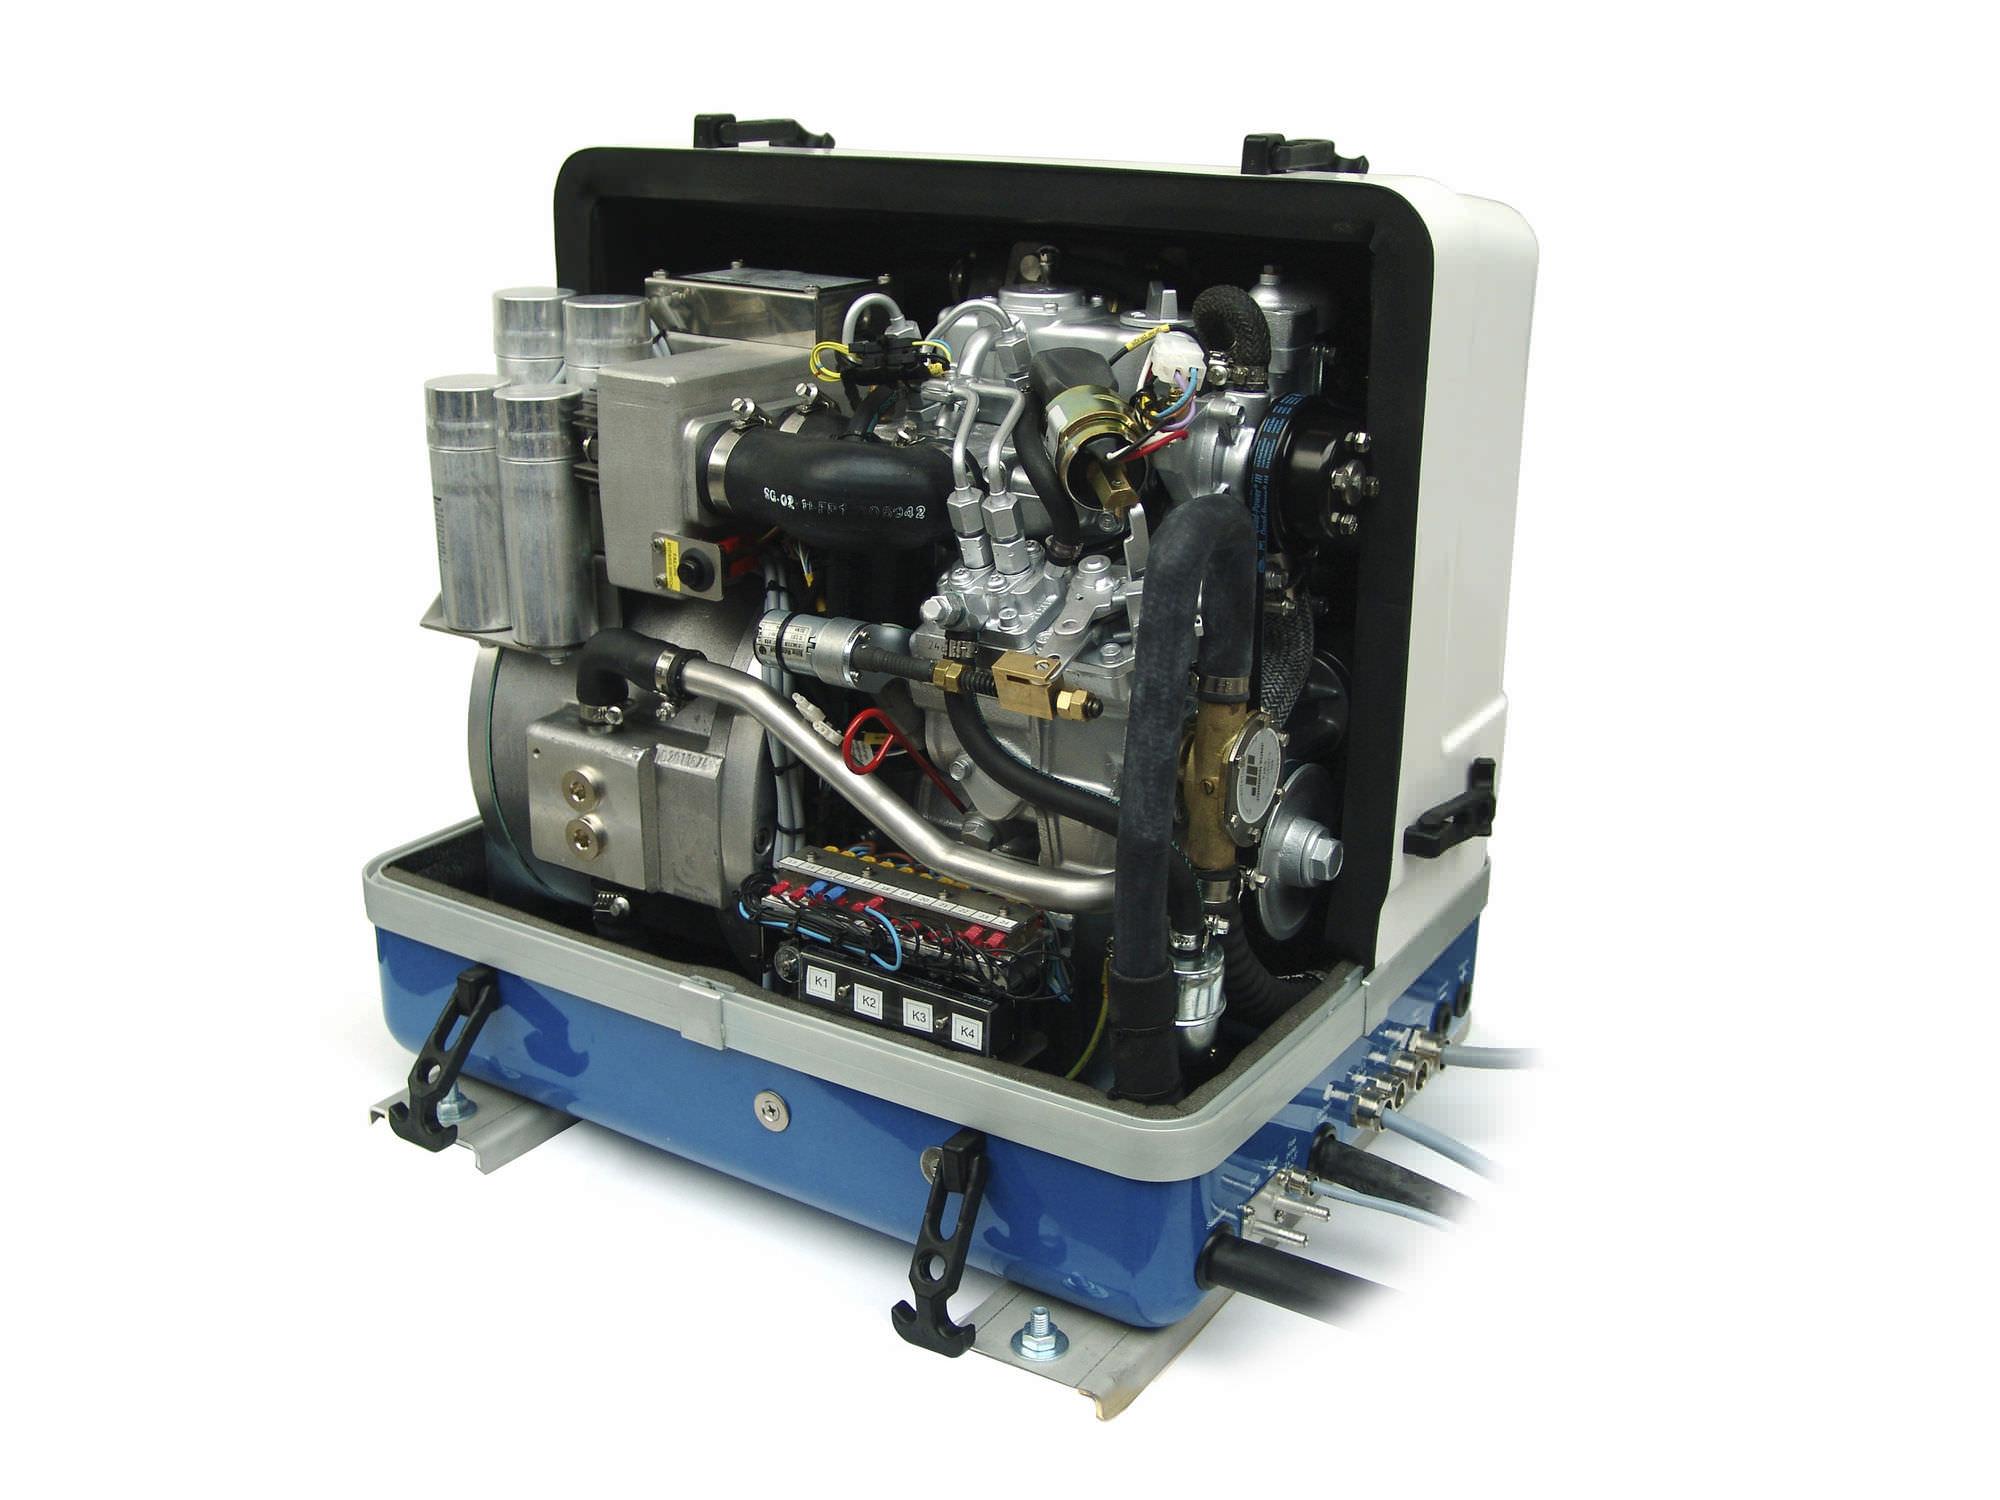 Boat generator set sel soundproofed PANDA 8000 PMS